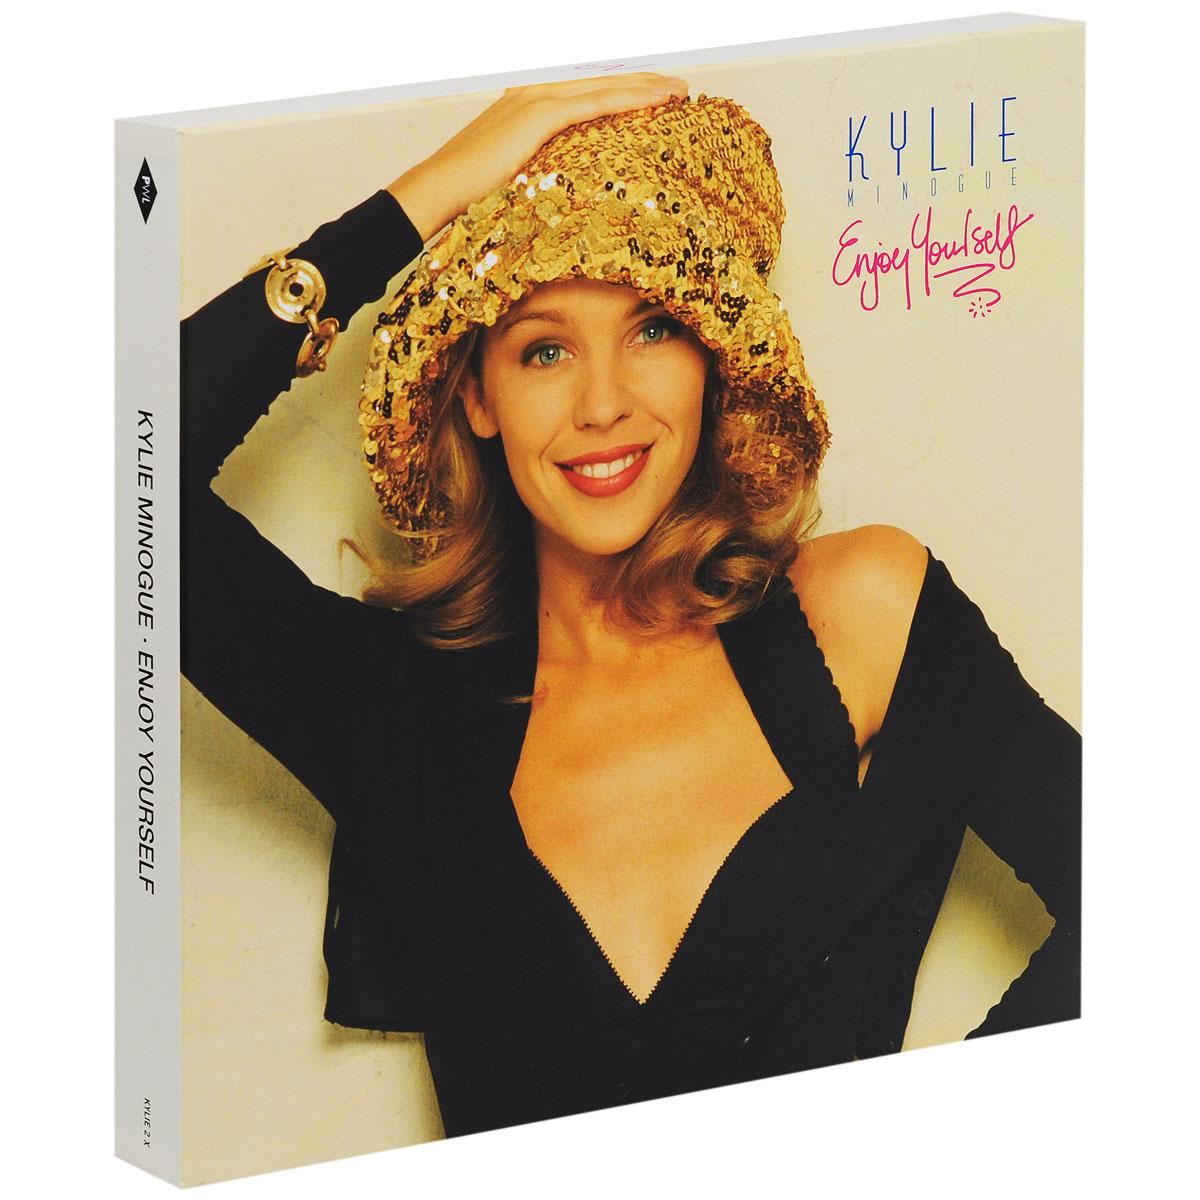 Kylie Minogue. Enjoy Yourself (2 CD + DVD + LP) 2015 2 CD + DVD + Vinyl LP